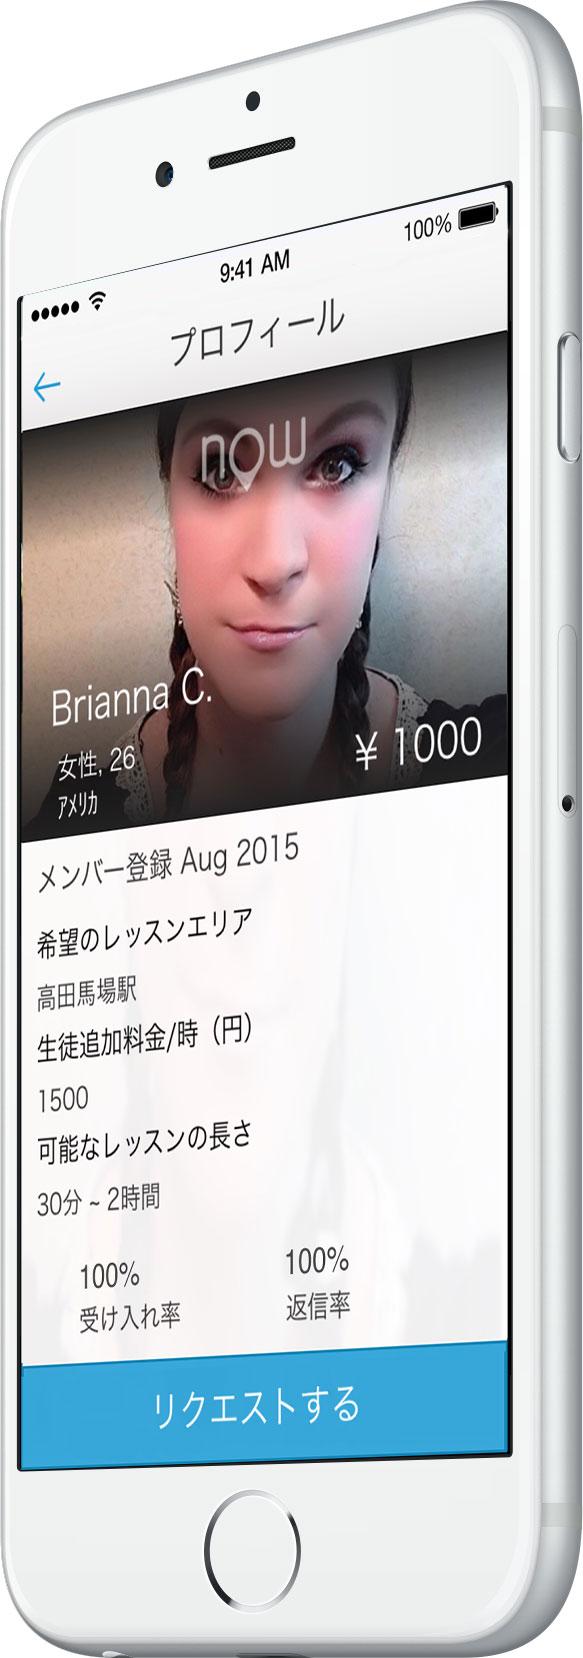 Brianna_side.jpg